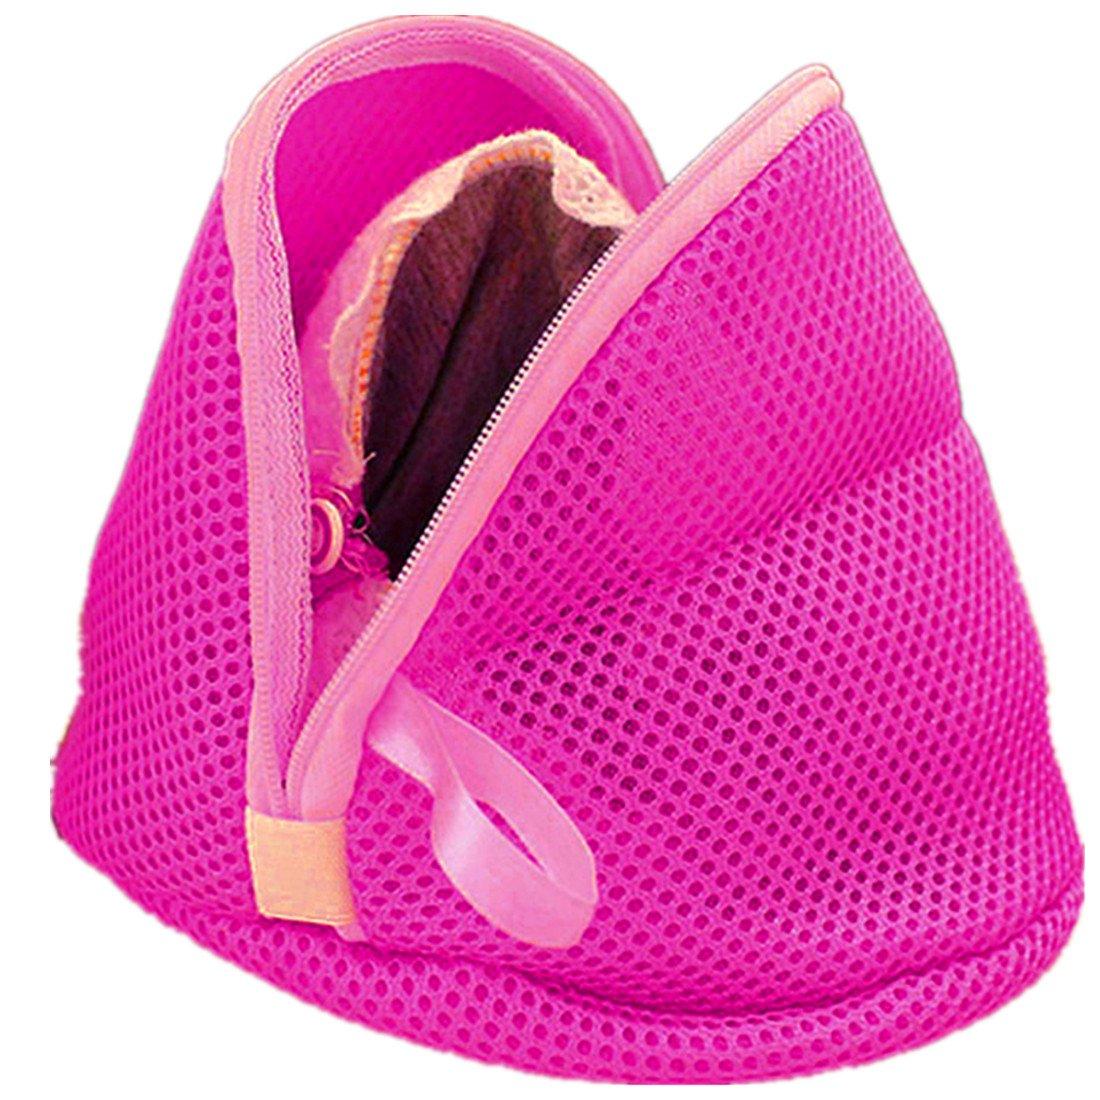 HANYI Lingerie Underwear Bra Sock Pop Up Washing Clothes Laundry Rose Bag